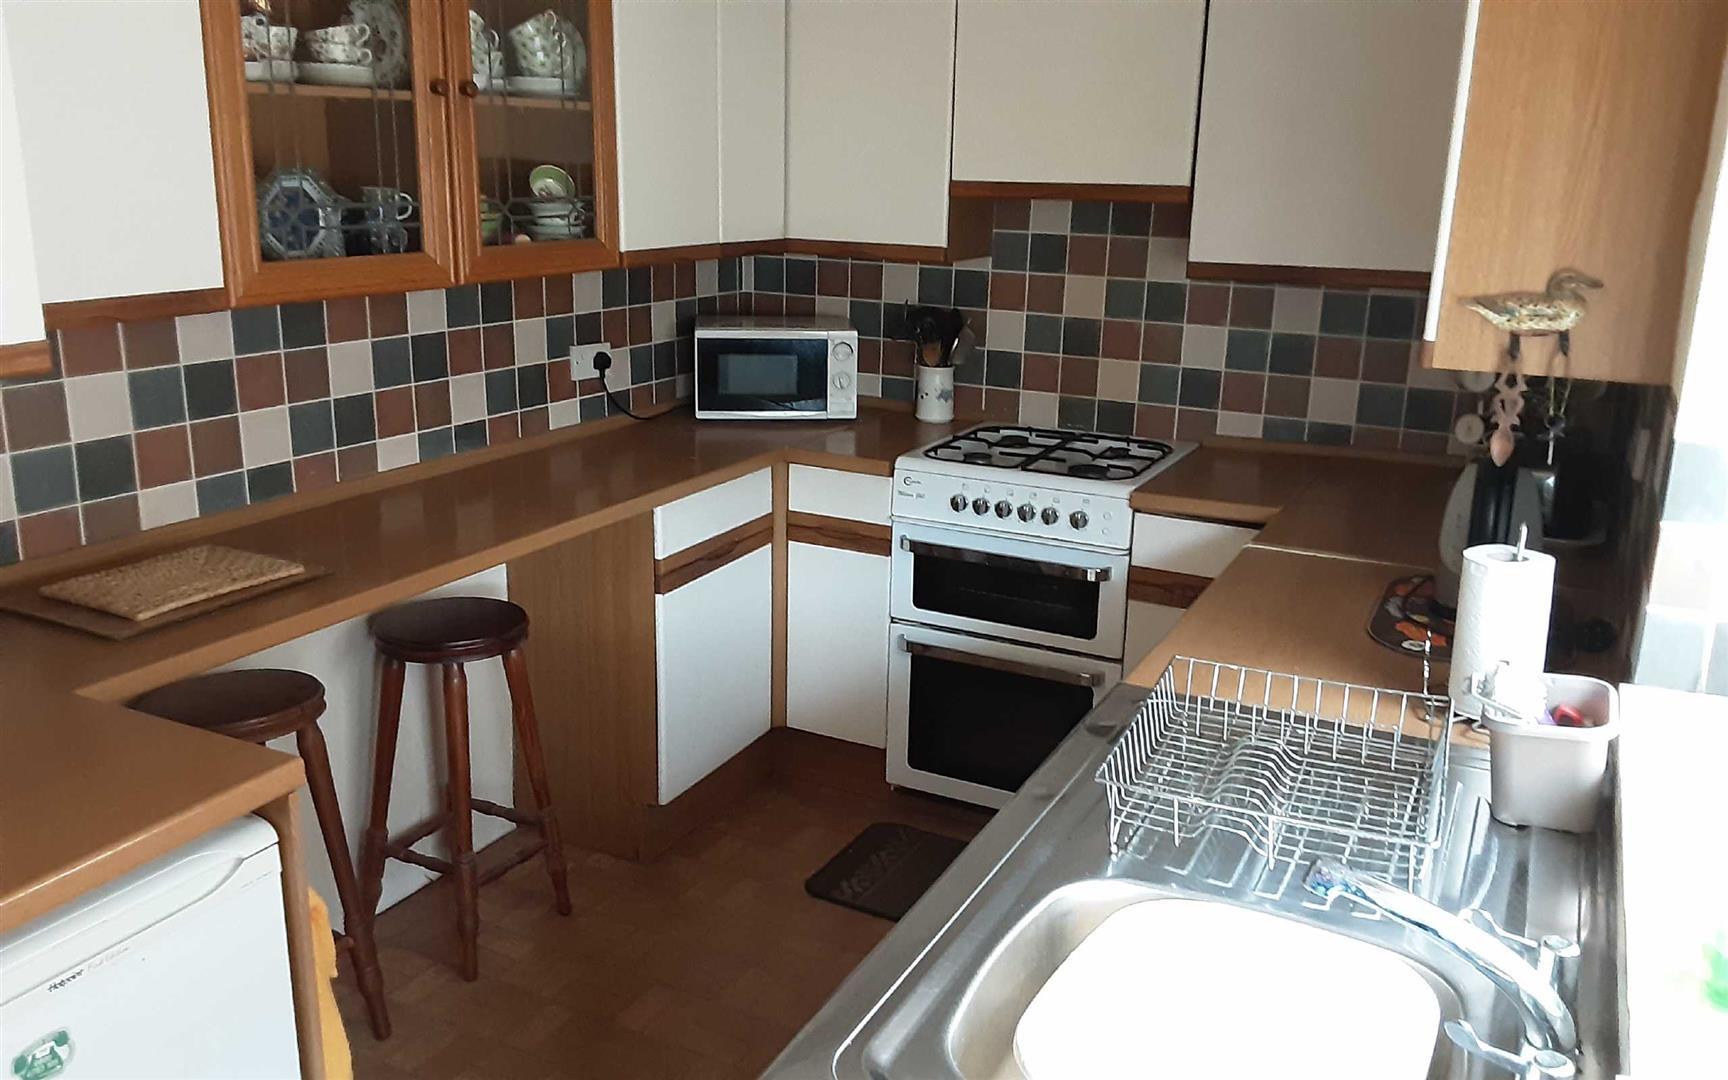 Heol Eirlys, Clasemont Park Morriston, Swansea, SA6 6HA